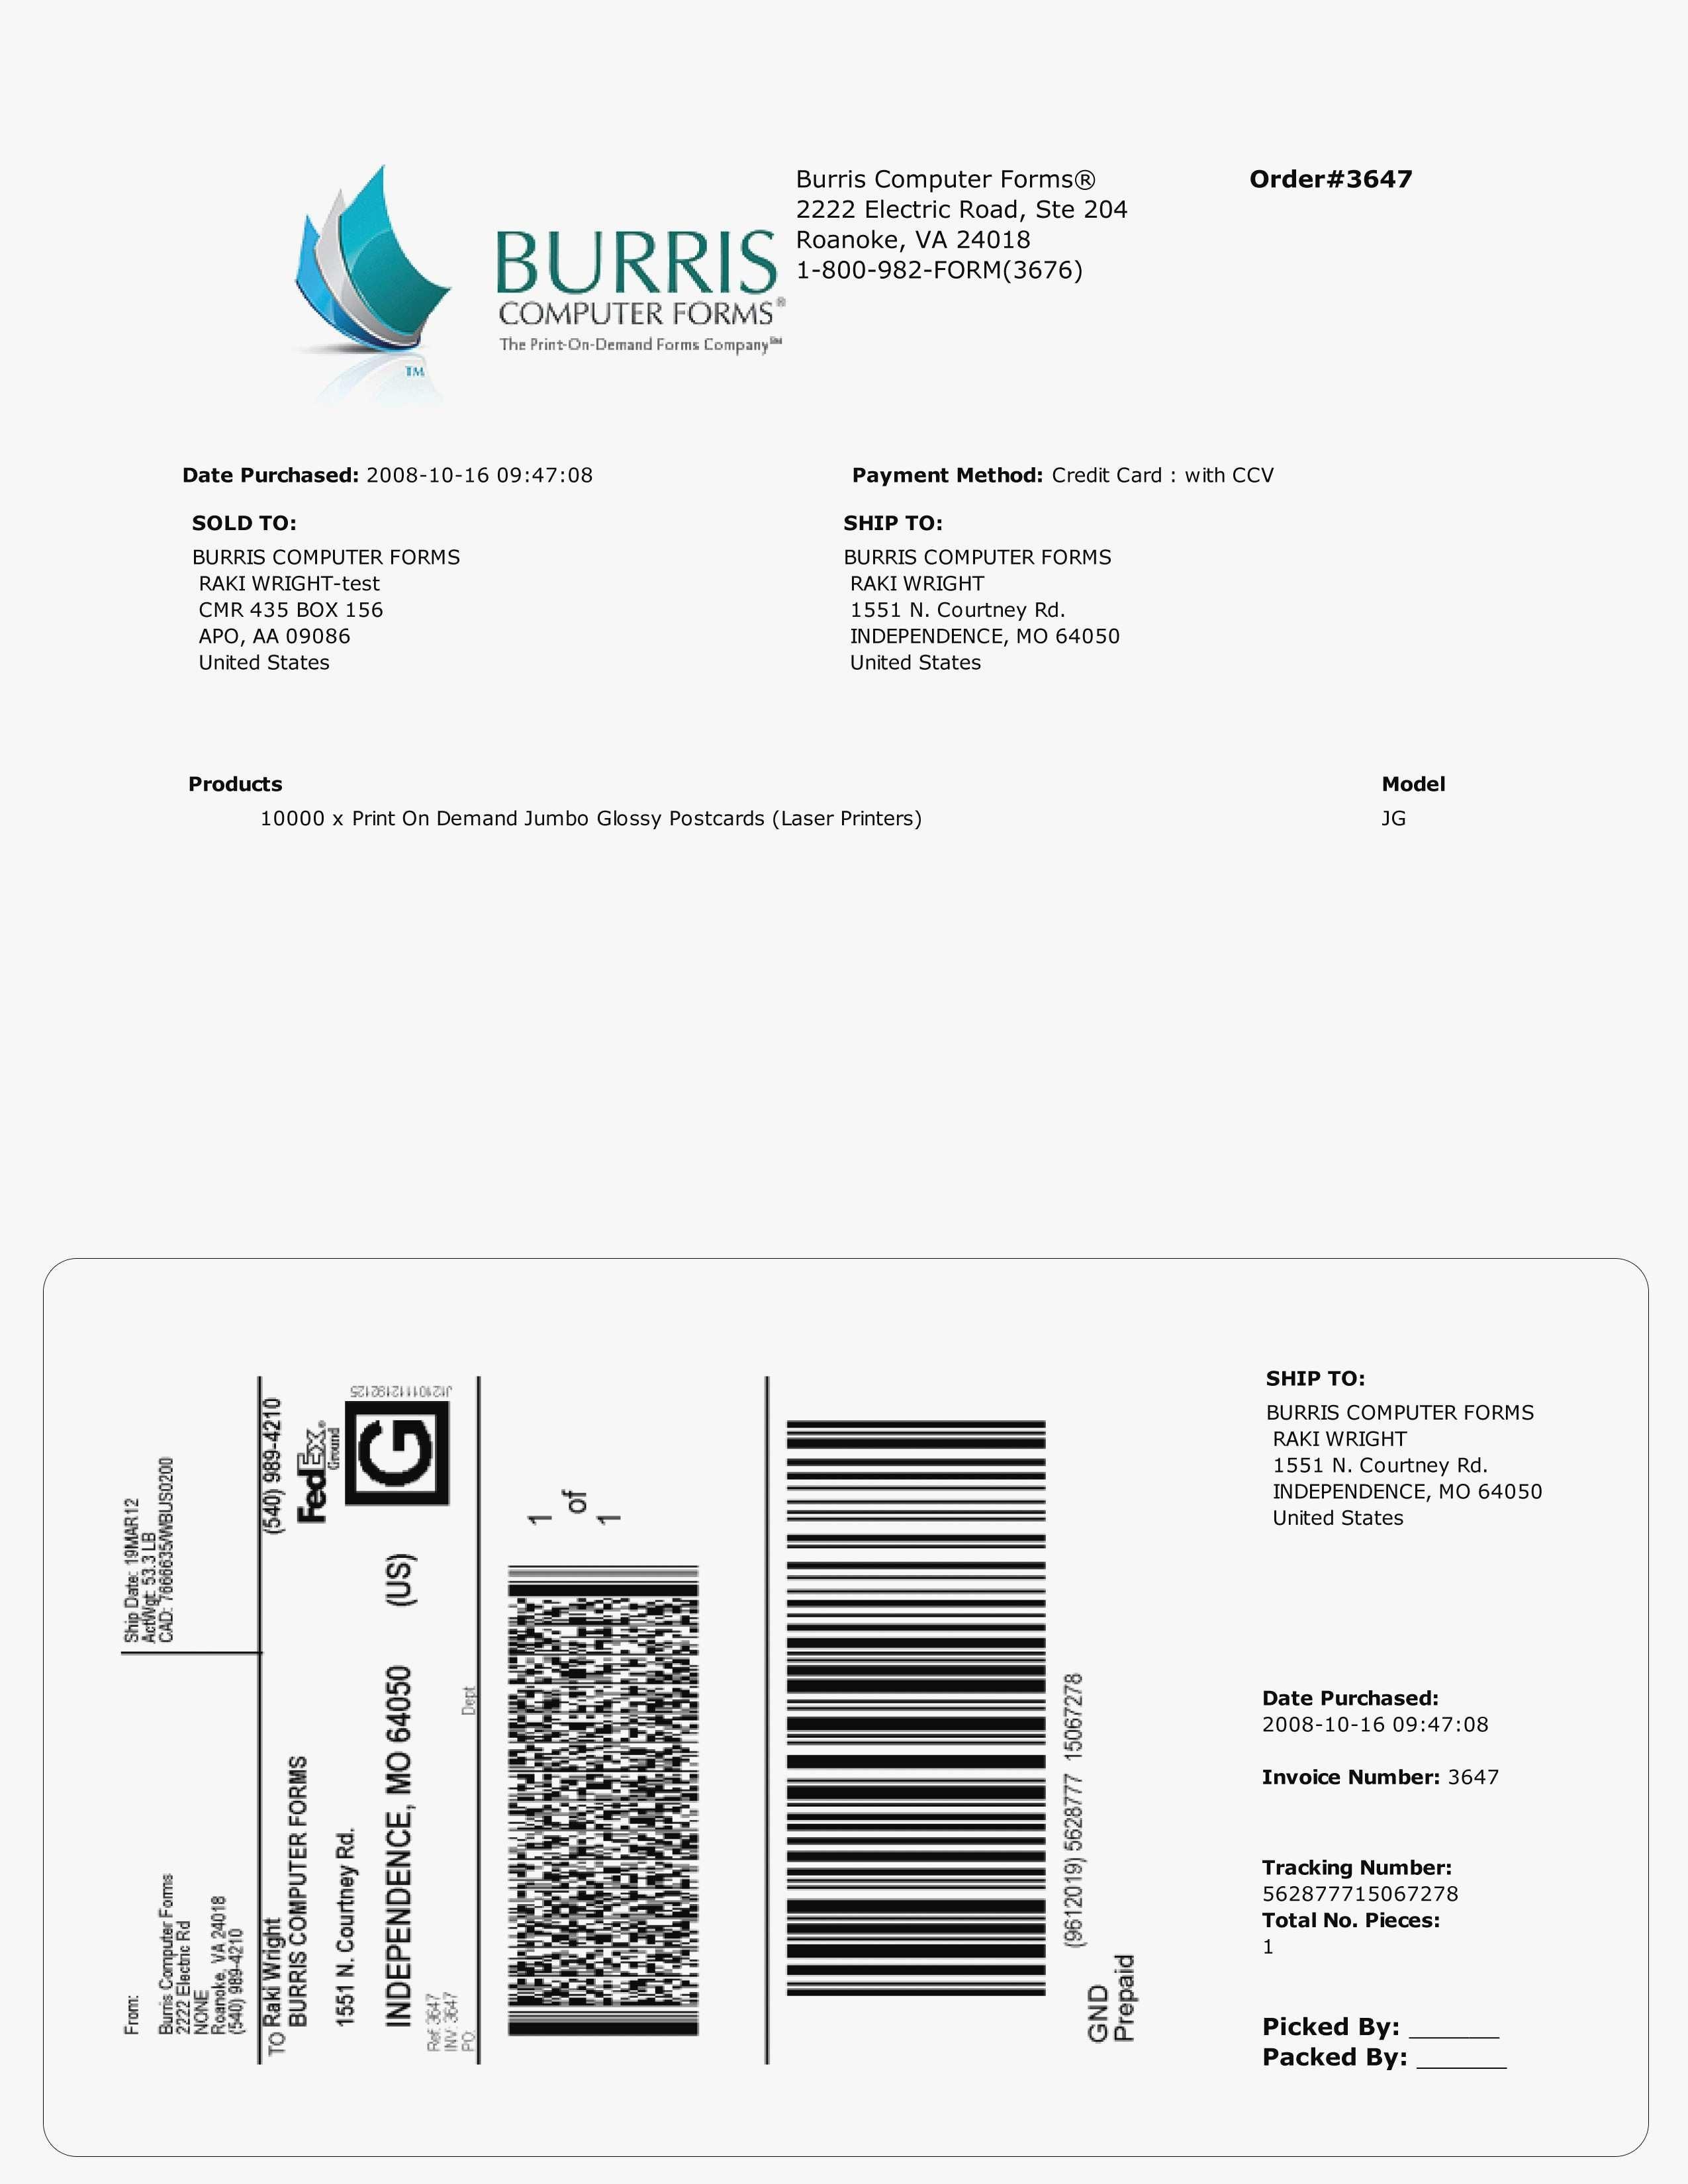 New Fedex Print Shipping Label - Acilmalumat - Free Printable Shipping Label Template